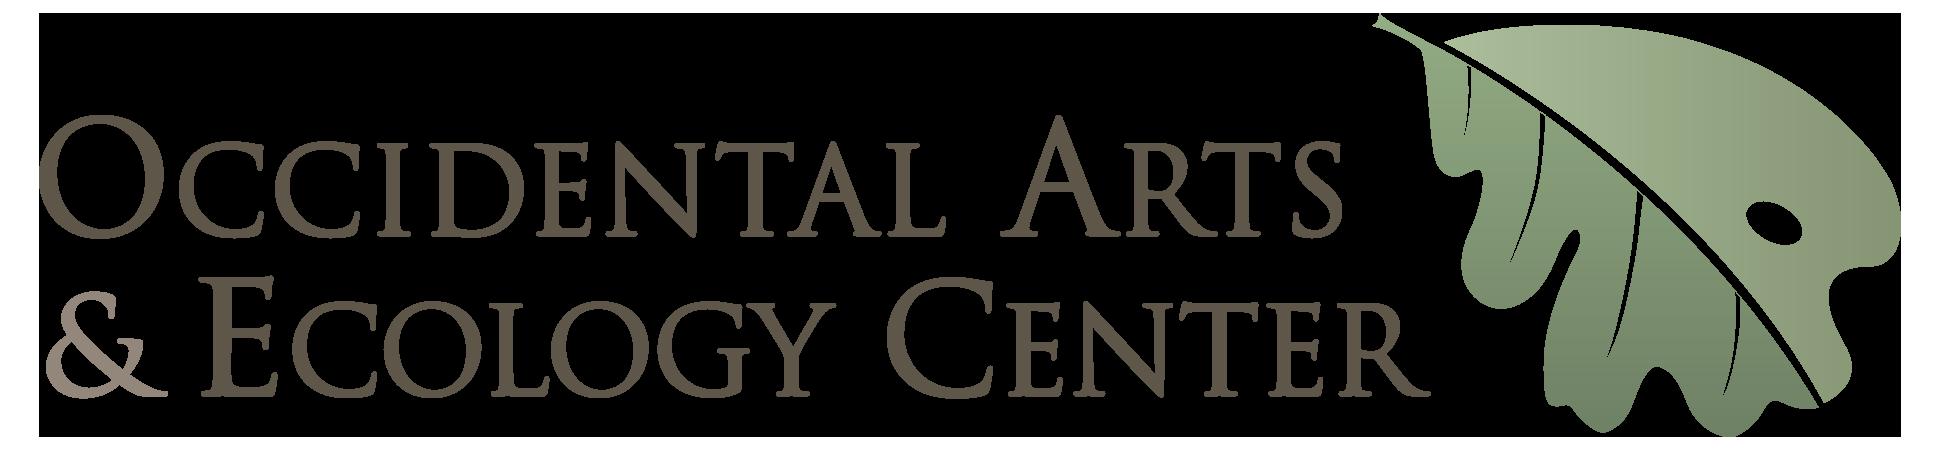 OAEC-Horizontal-Logo_(1).png